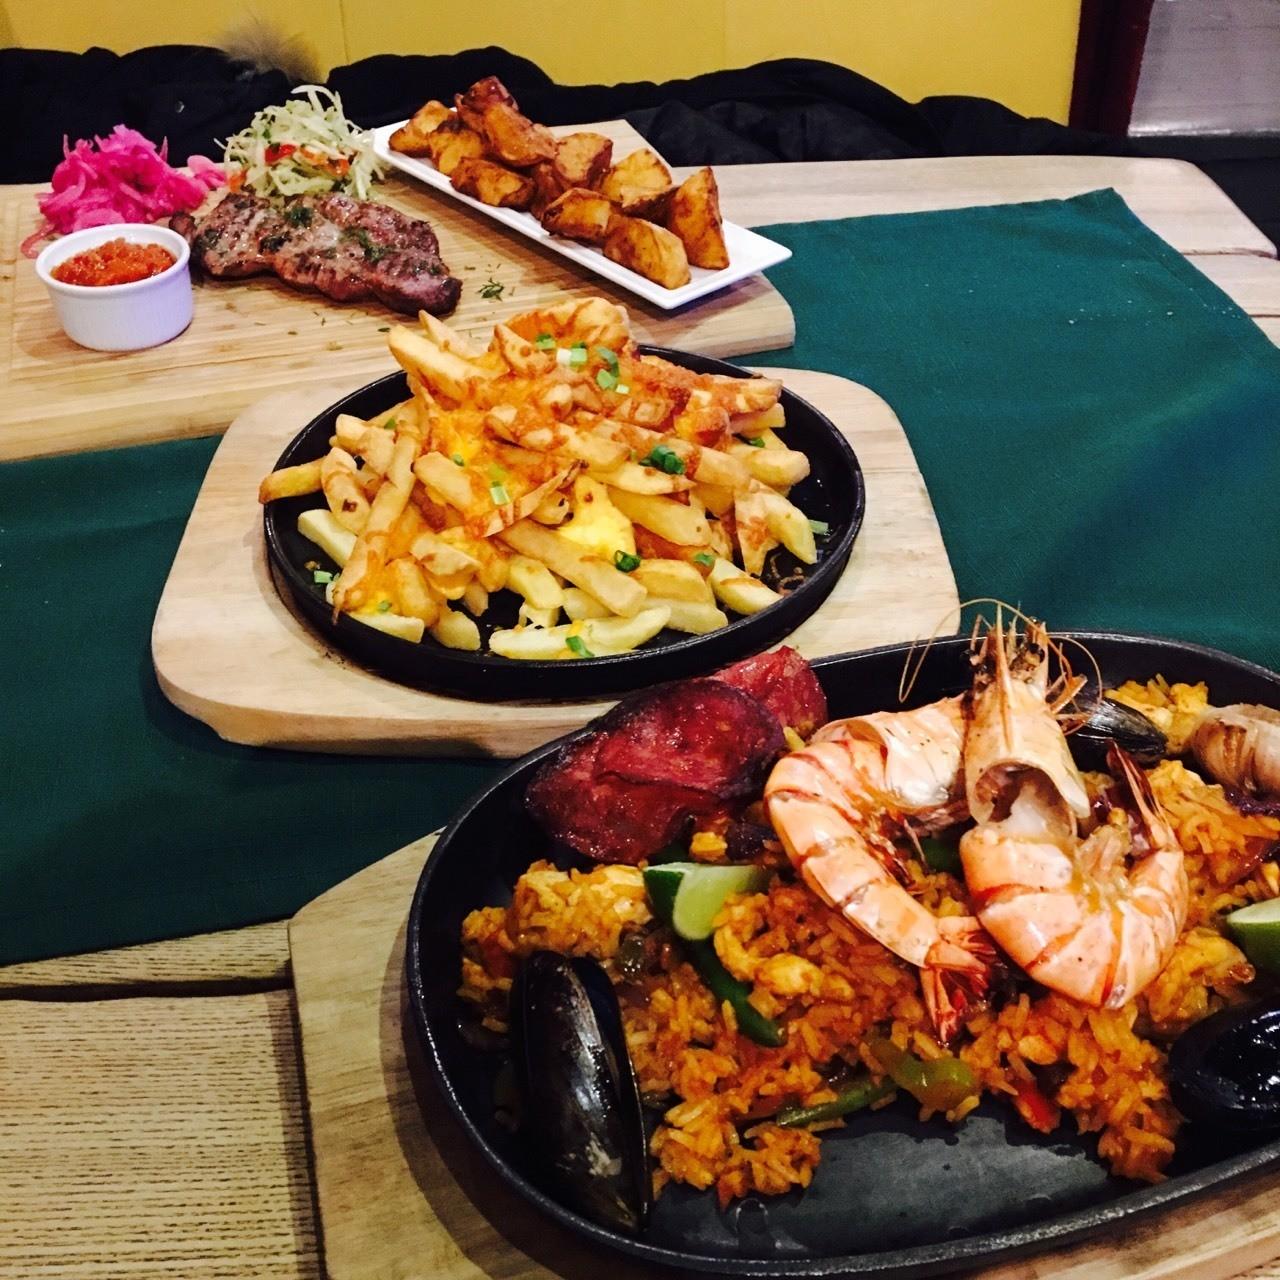 TEX REX 里加老城区附近一家24小时开放的餐厅,便宜,好吃,饮料调得也超棒